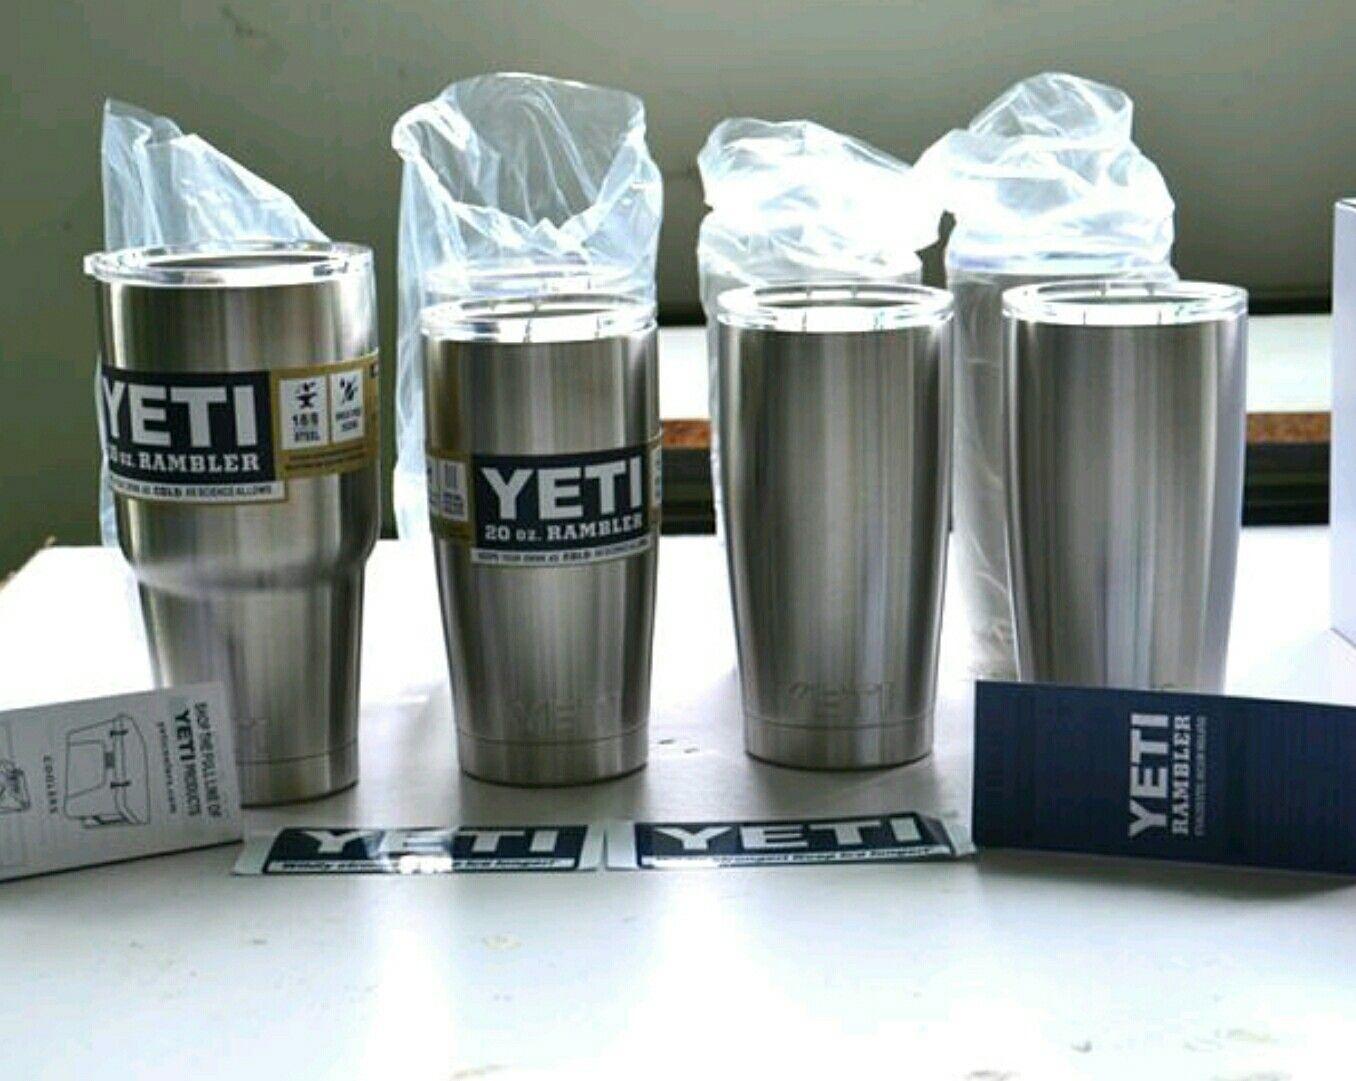 41++ Yeti coffee mug sizes ideas